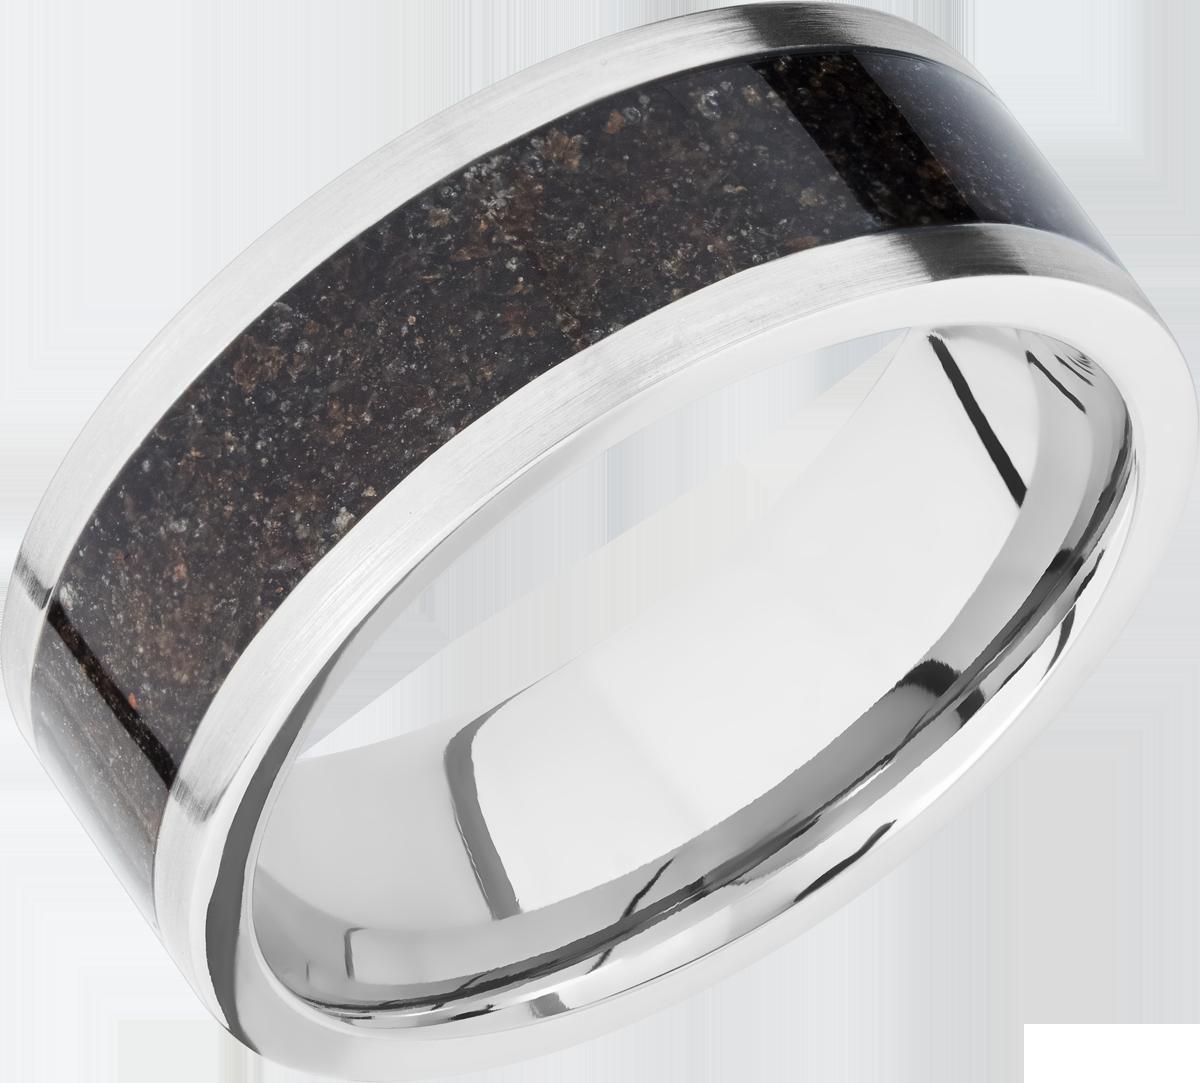 Men's Flat Profile Titanium Ring with Black Dinosaur Bone Inlay